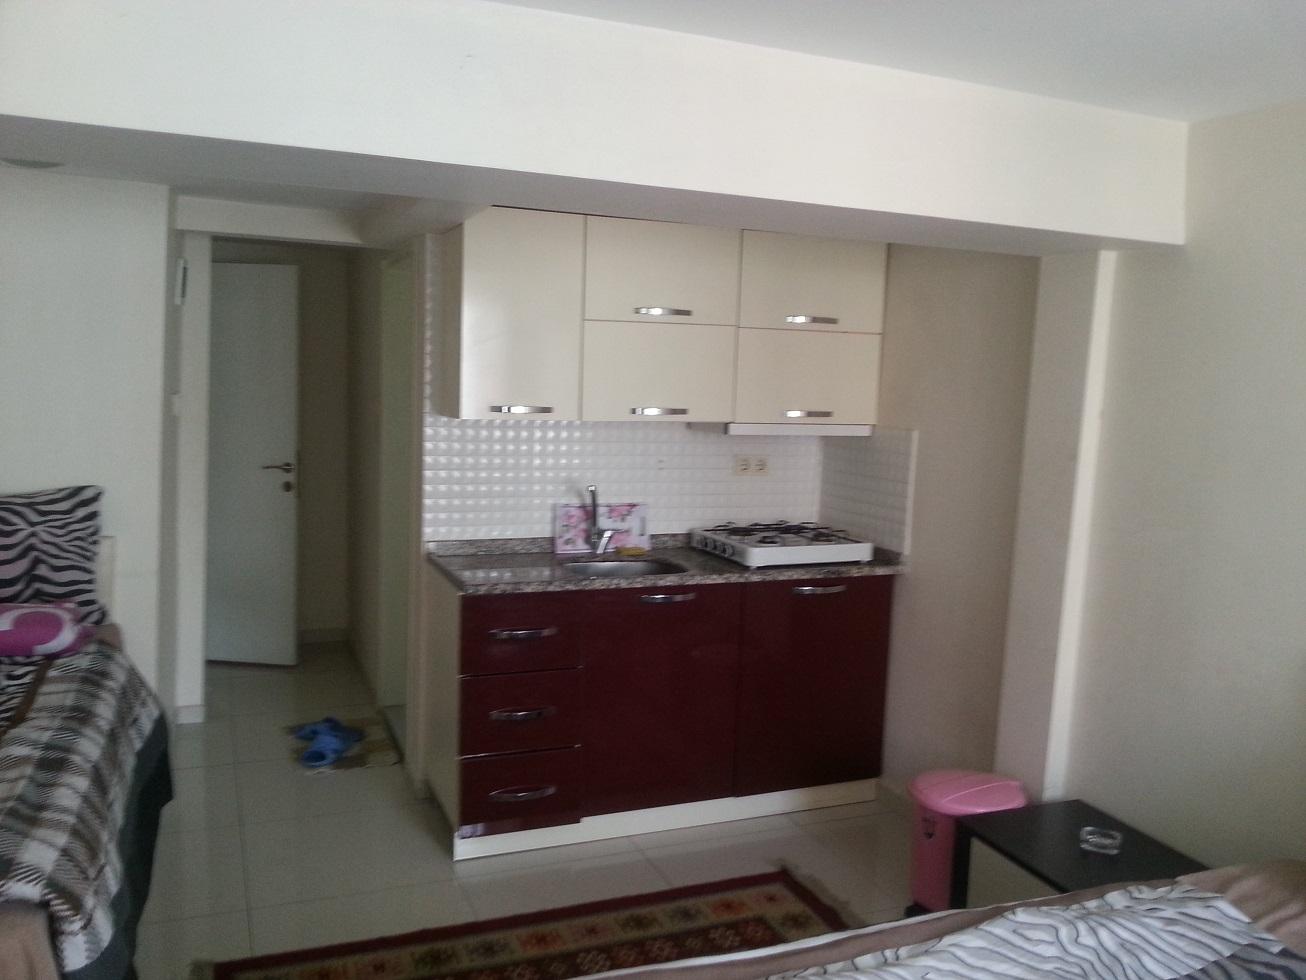 location appartement metz des conomies significatives. Black Bedroom Furniture Sets. Home Design Ideas